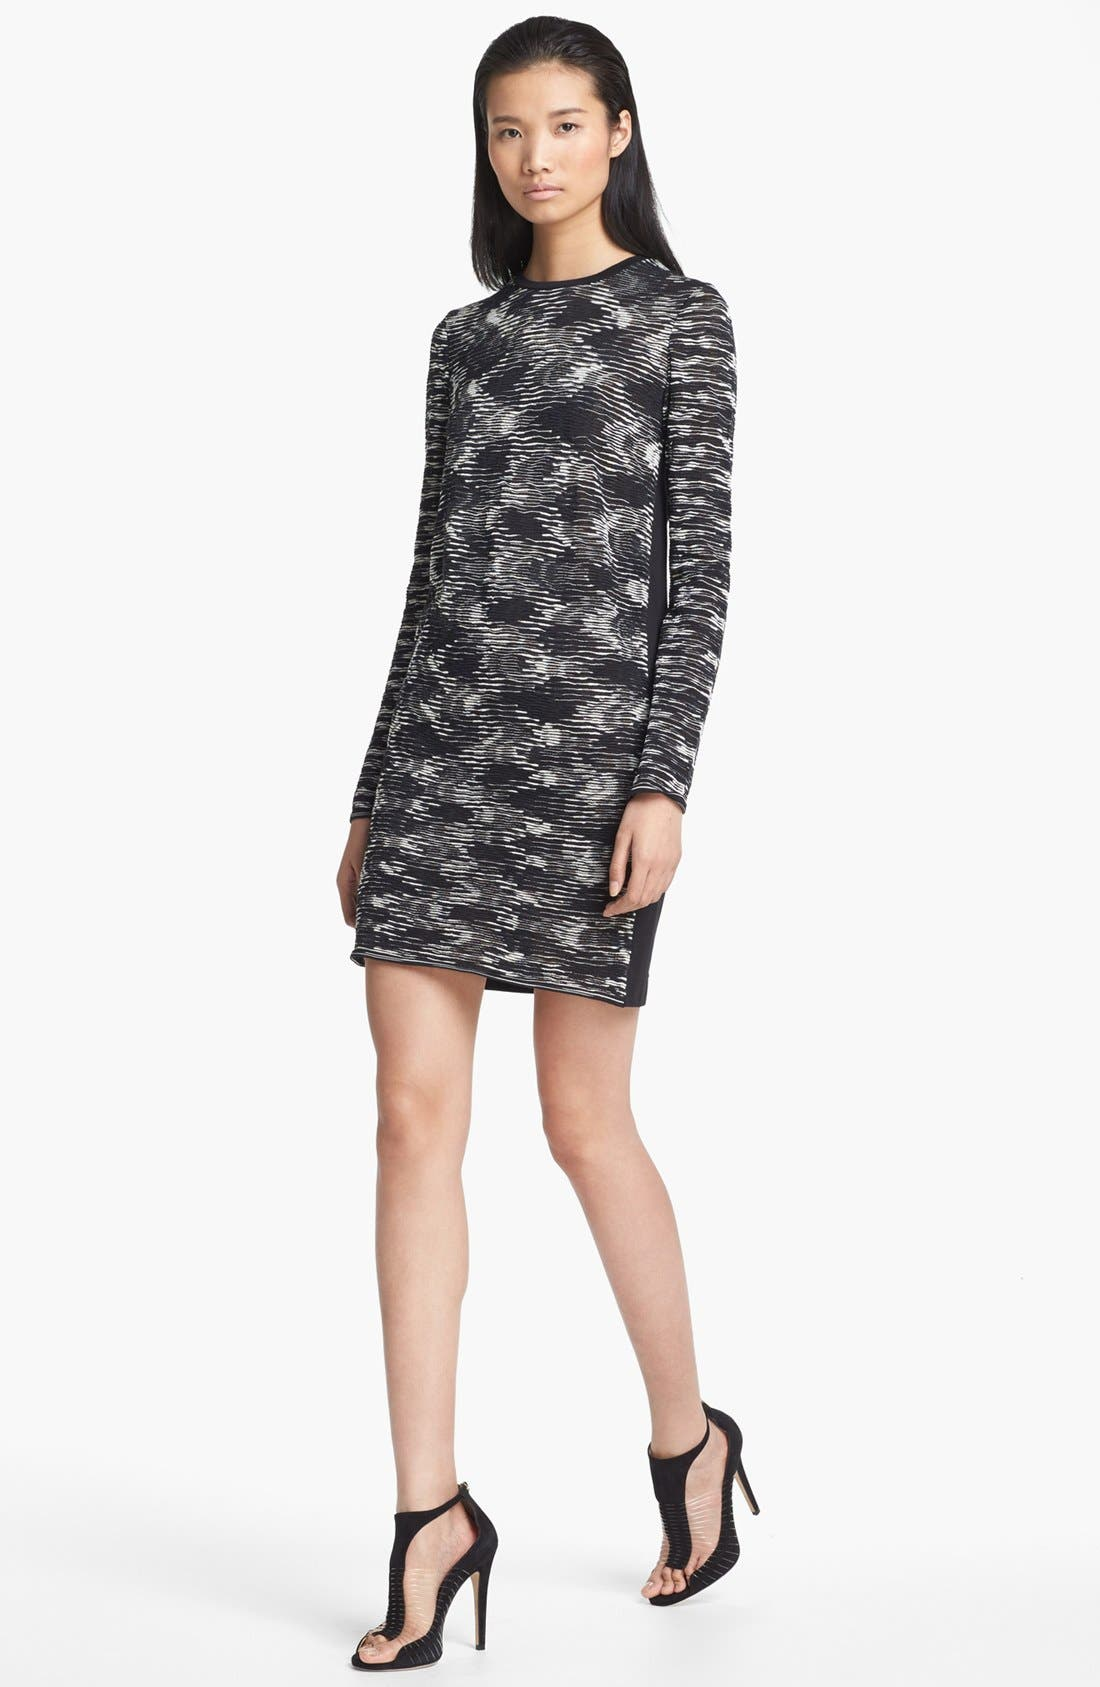 Alternate Image 1 Selected - M Missoni Mixed Media Dress